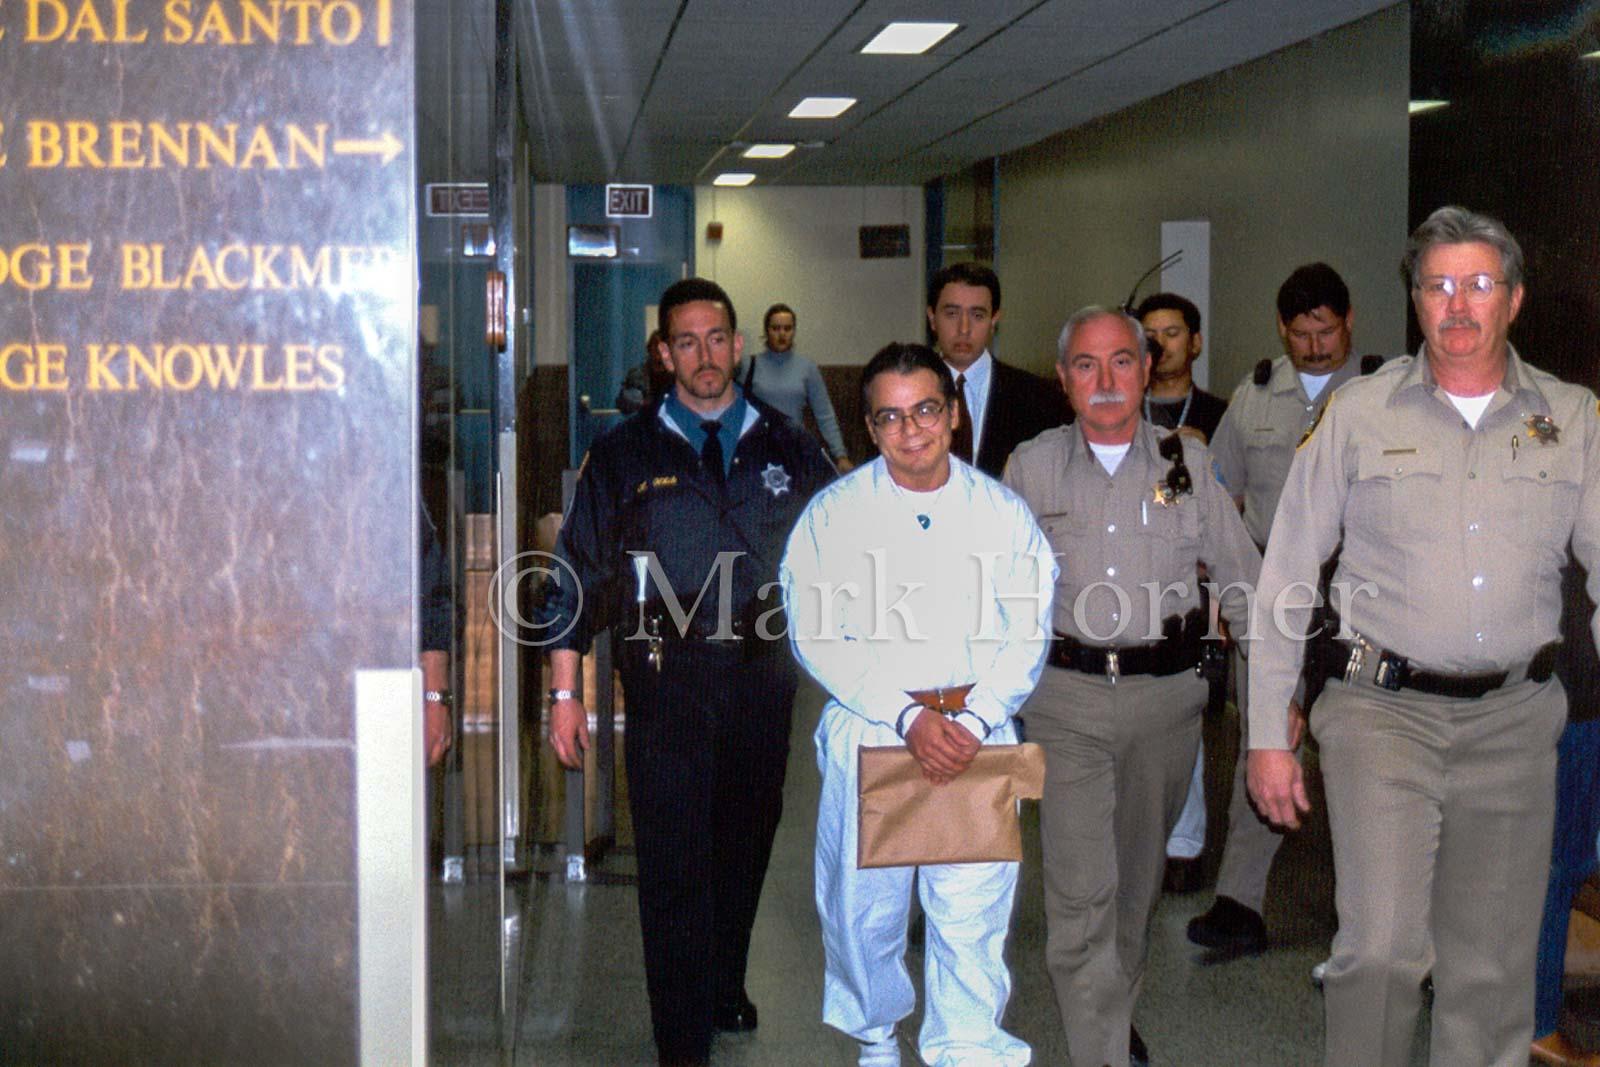 Diazien Hossencofft arraignment